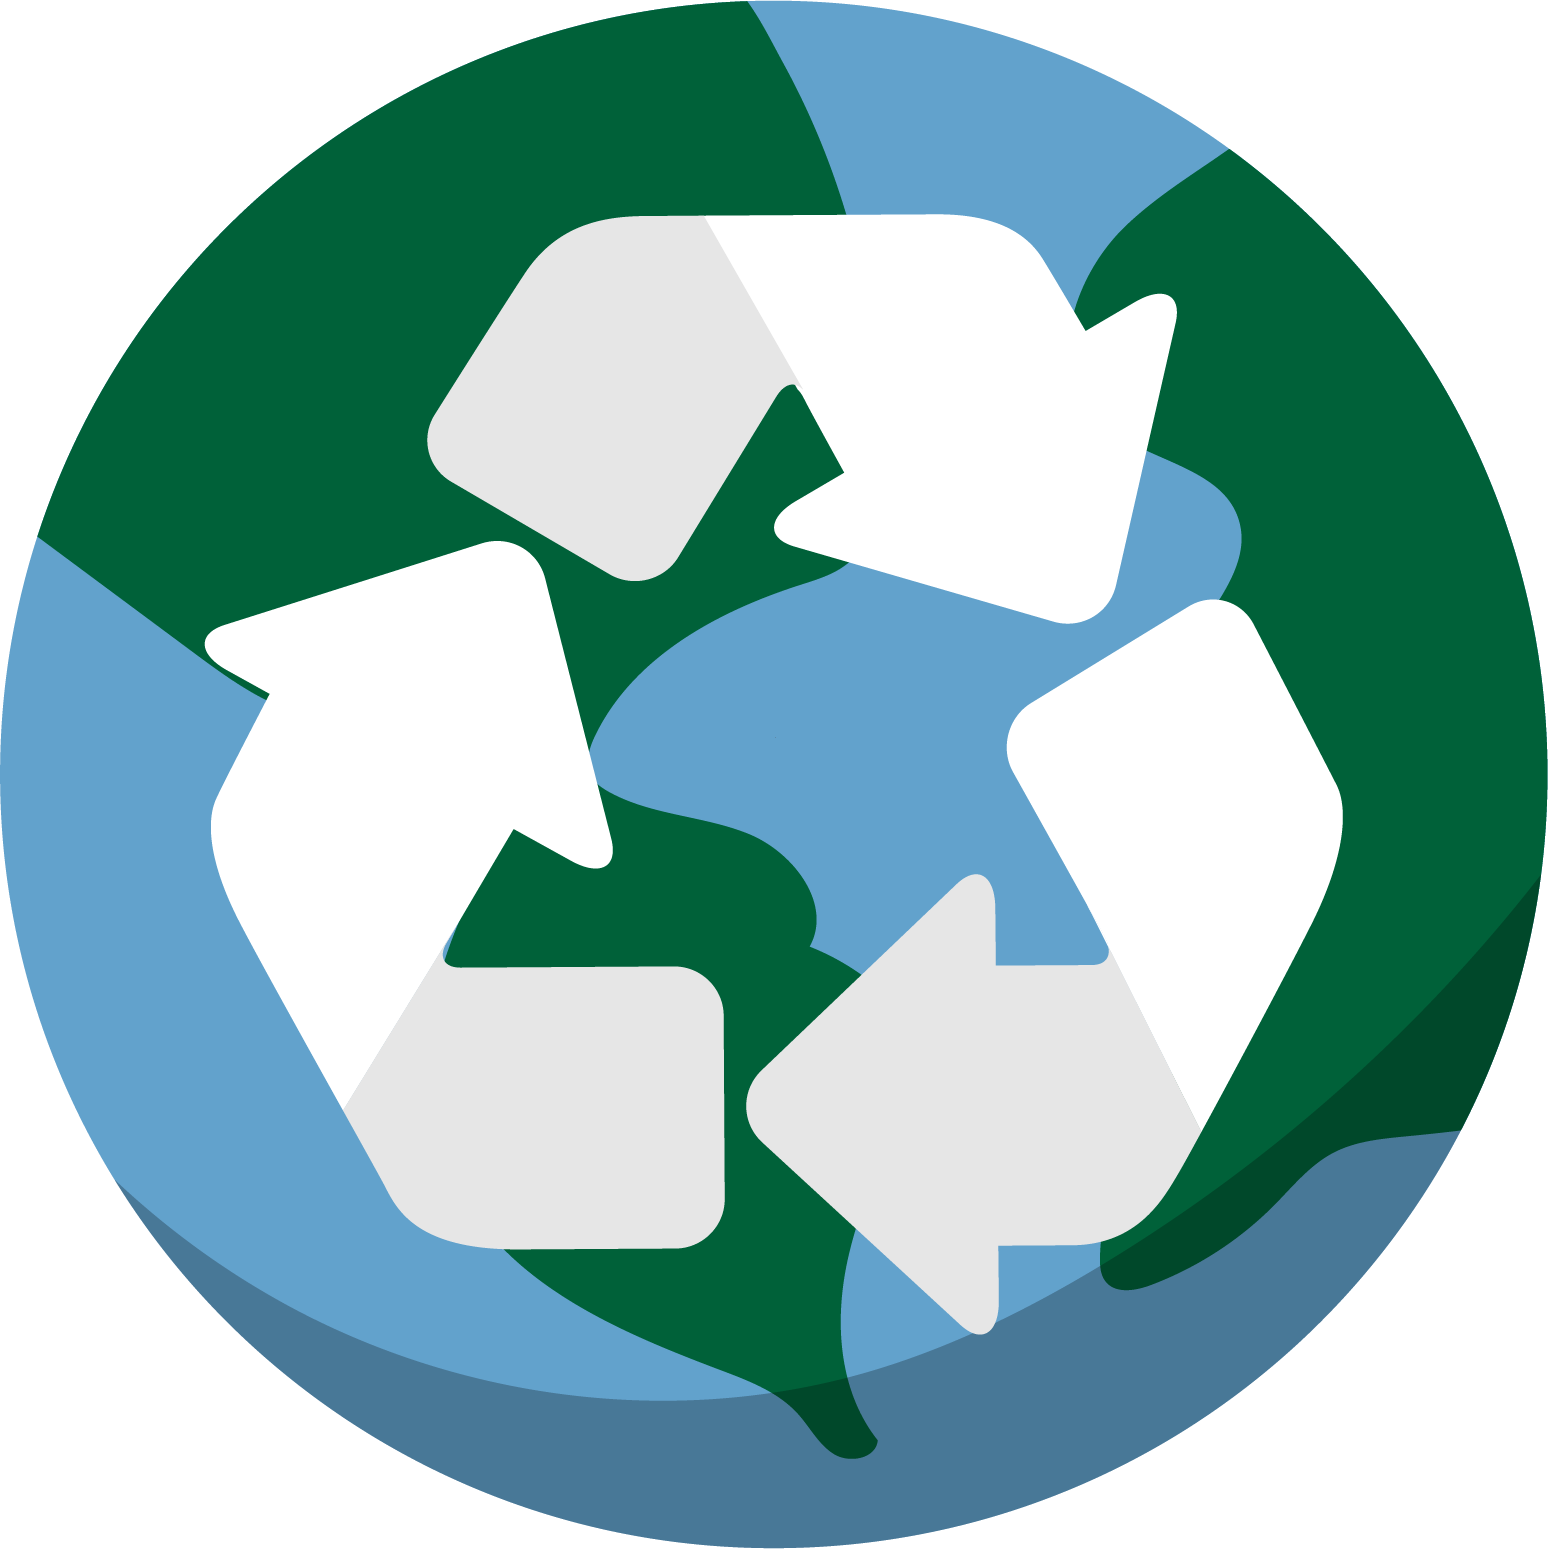 Sustainabilitty Icons